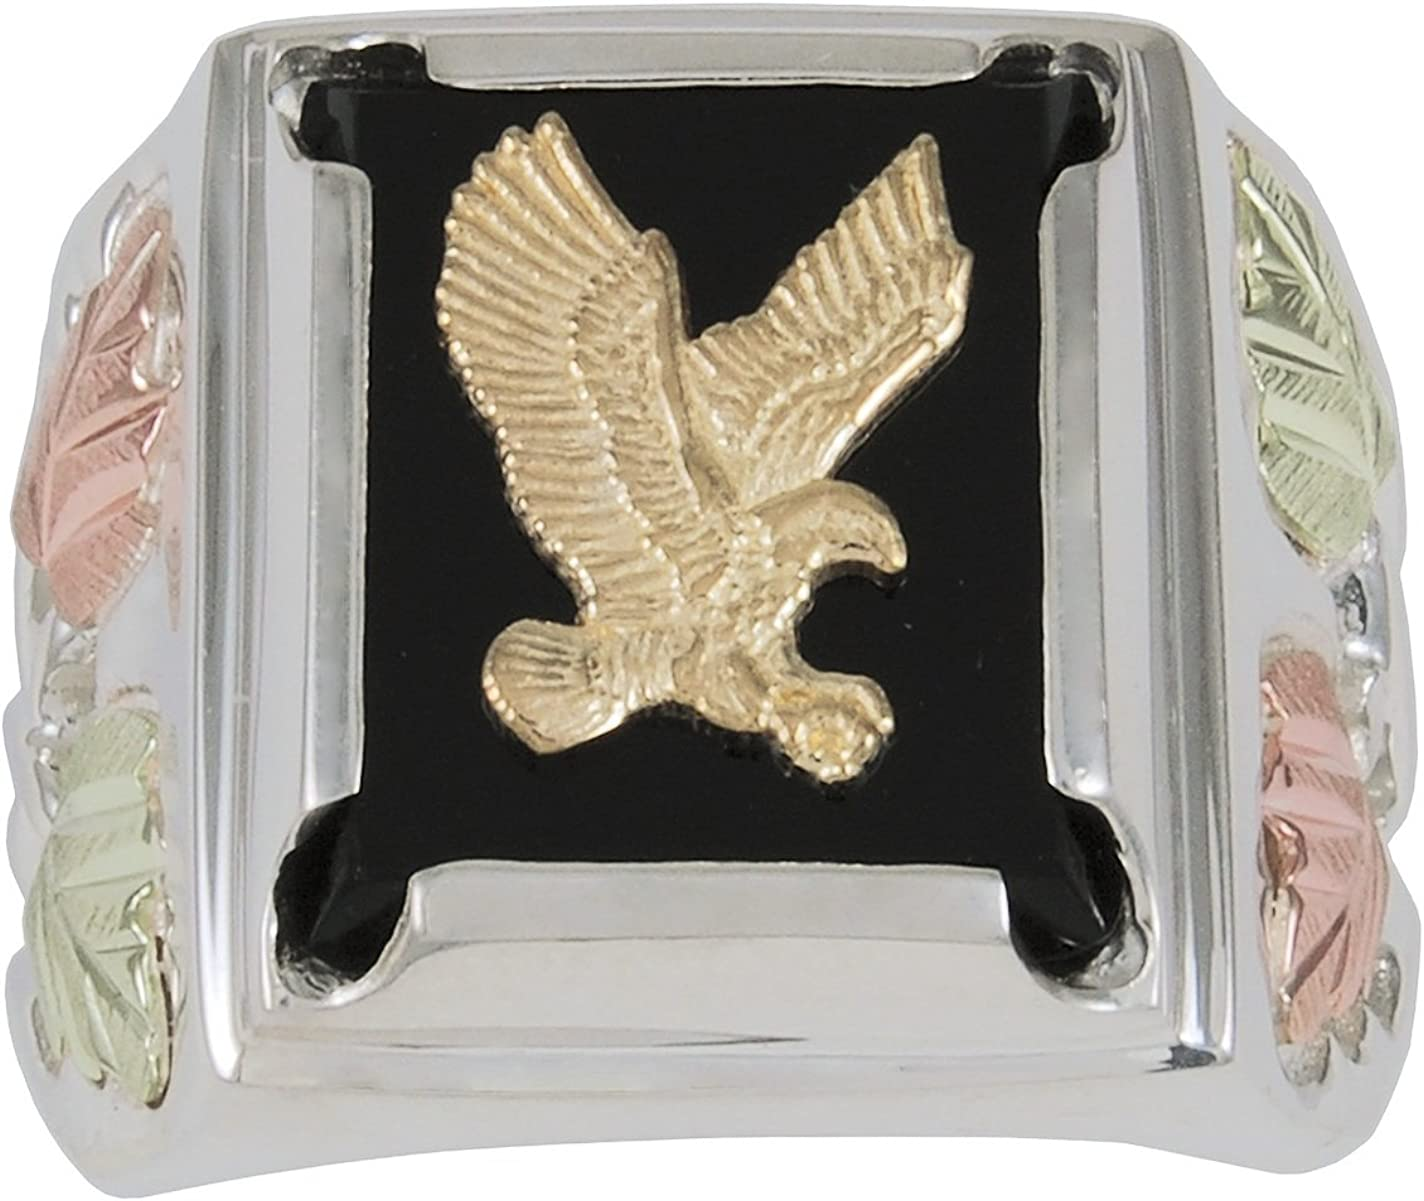 Mens Eagle Onyx Ring Sterling Silver 12k Green and Rose Gold Black Hills Gold Motif